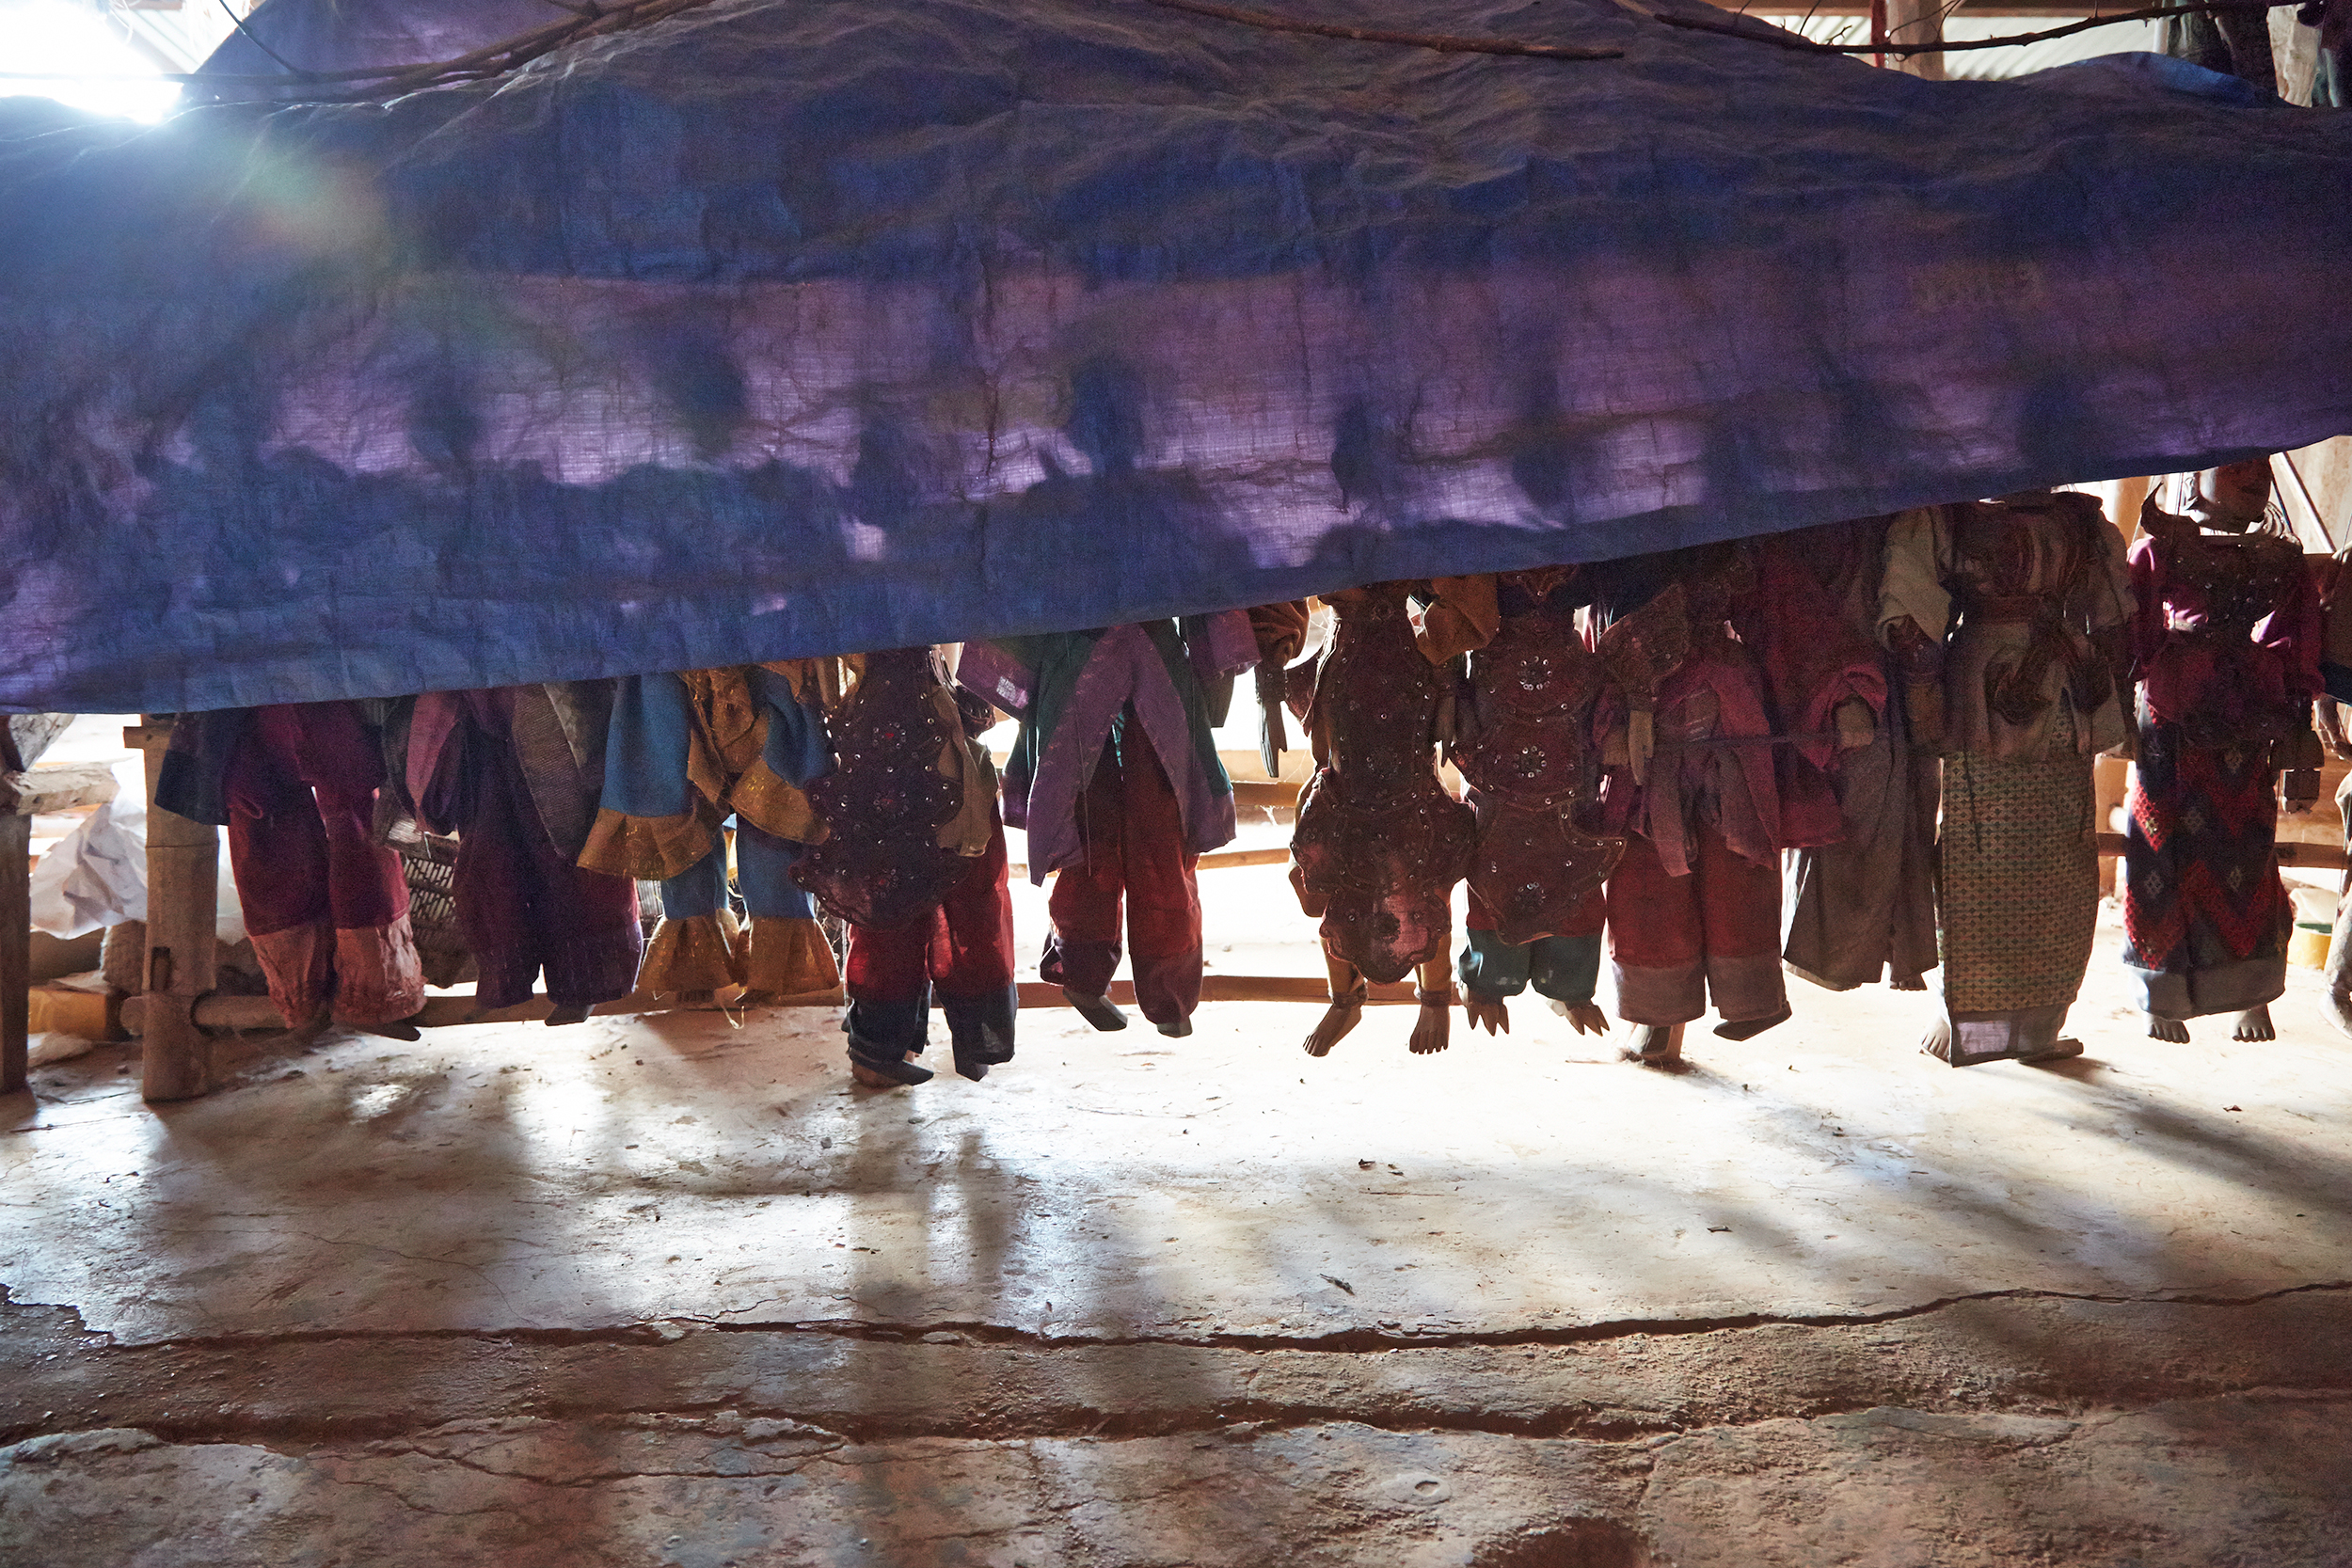 Kanjana-Chaiwatanachai-Image-Works_Mandalay-Riverside-2_2014.01.19_0223w.jpg